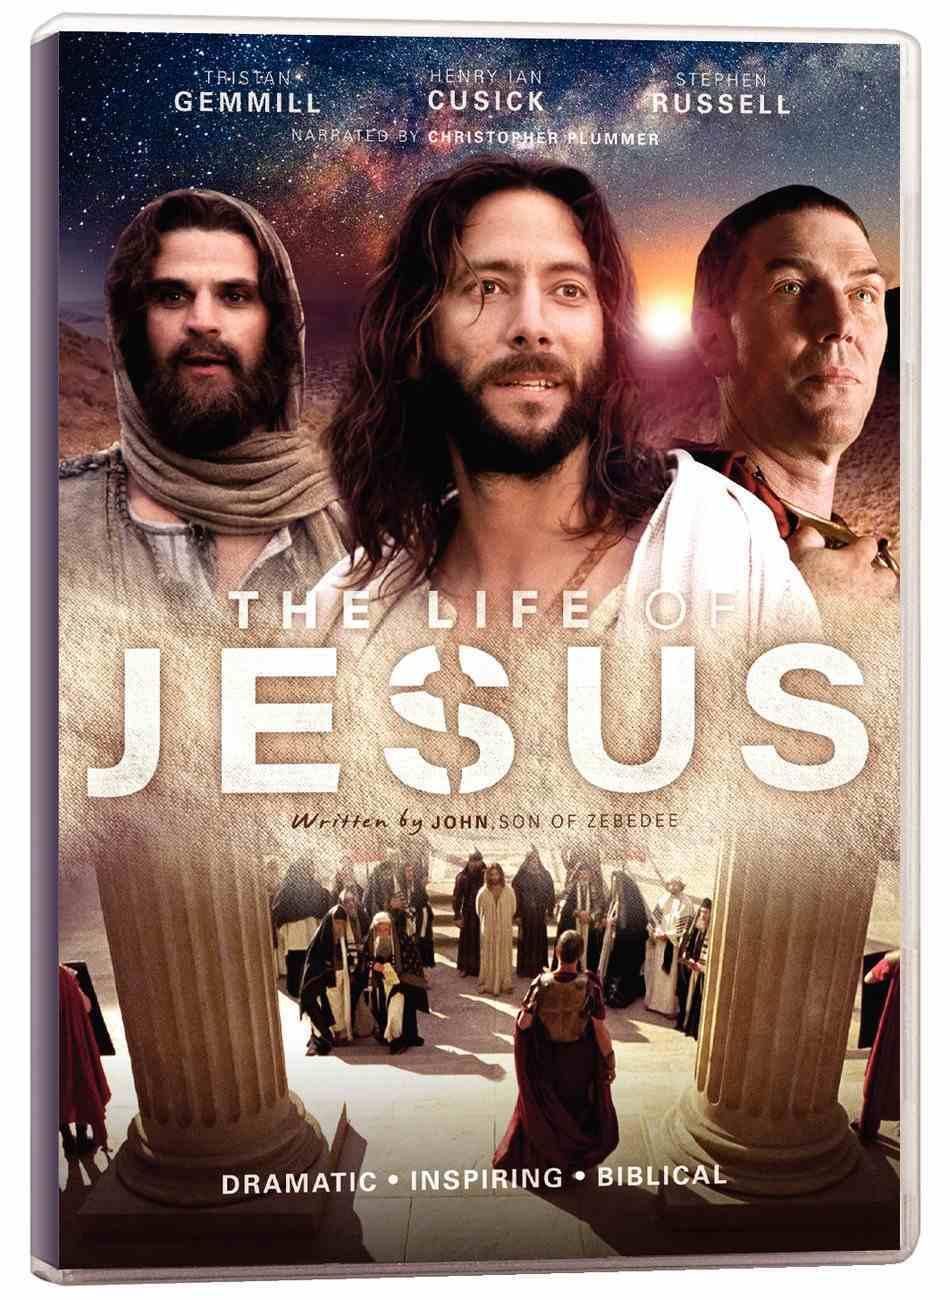 Life of Jesus (Previously John, Visual Bible Gospel Of John) DVD